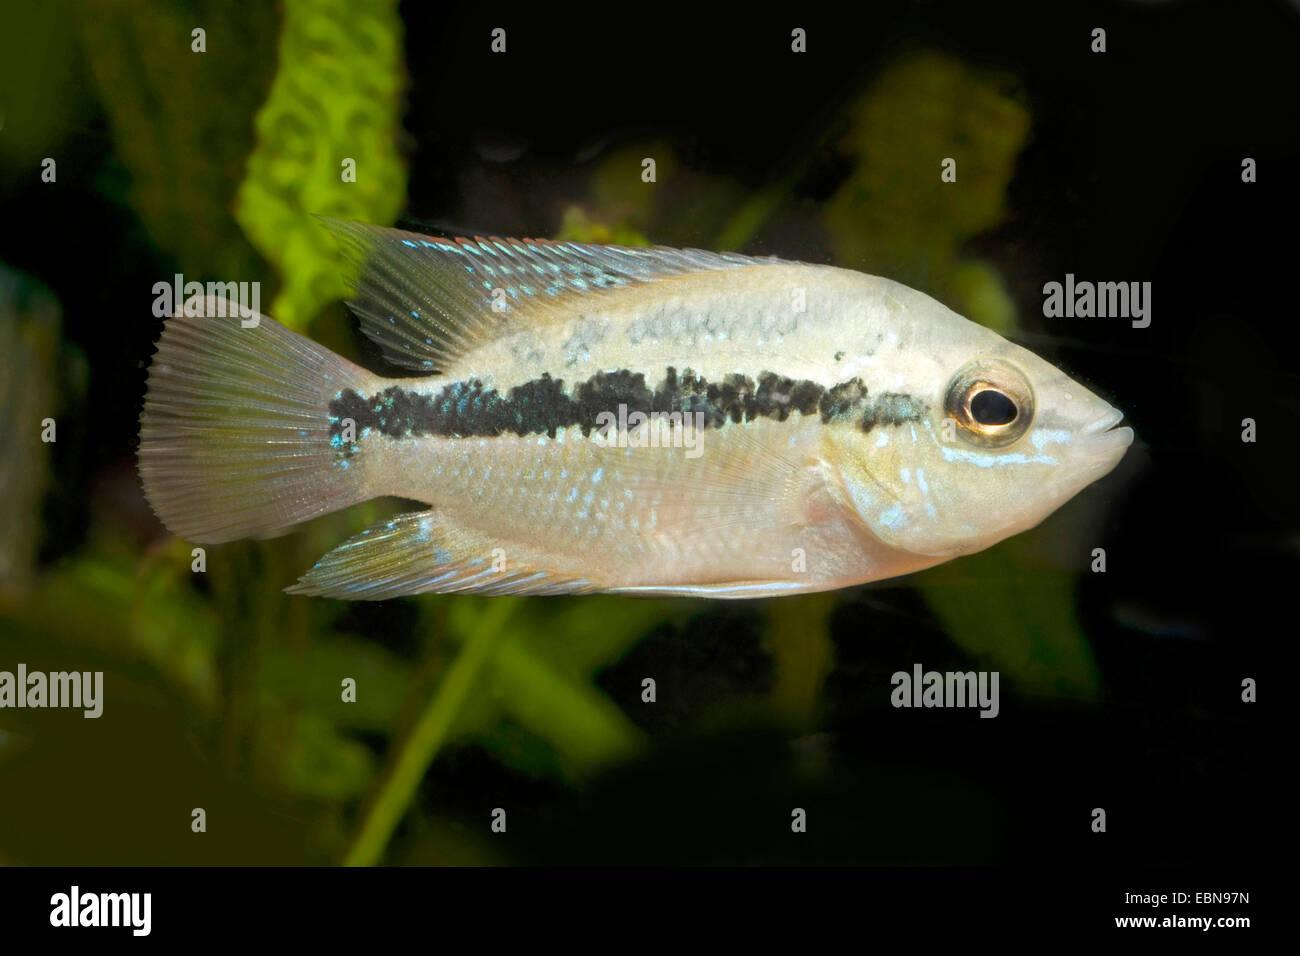 Salvin's Cichlid, Yellow Belly (Cichlasoma salvini, Nandopsis salvini), swimming - Stock Image